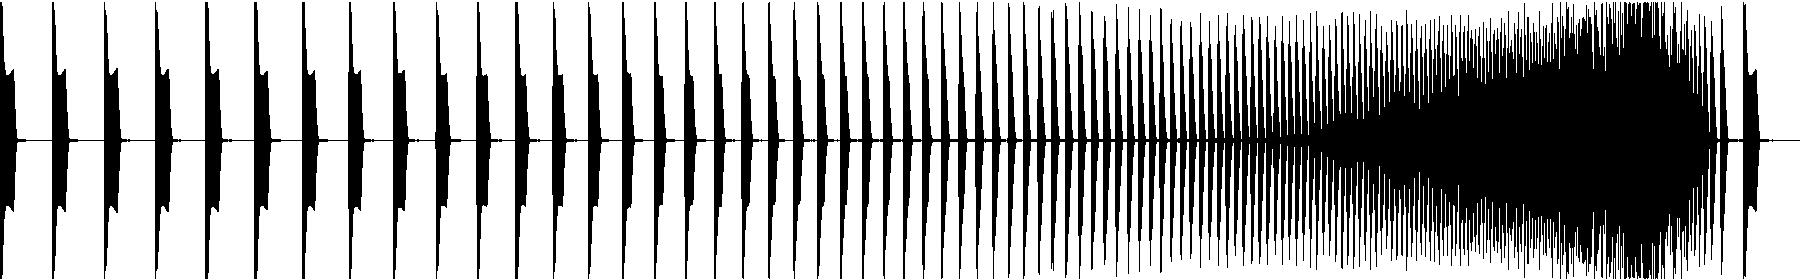 vuf1 128bpm accerlator sq 8bars c